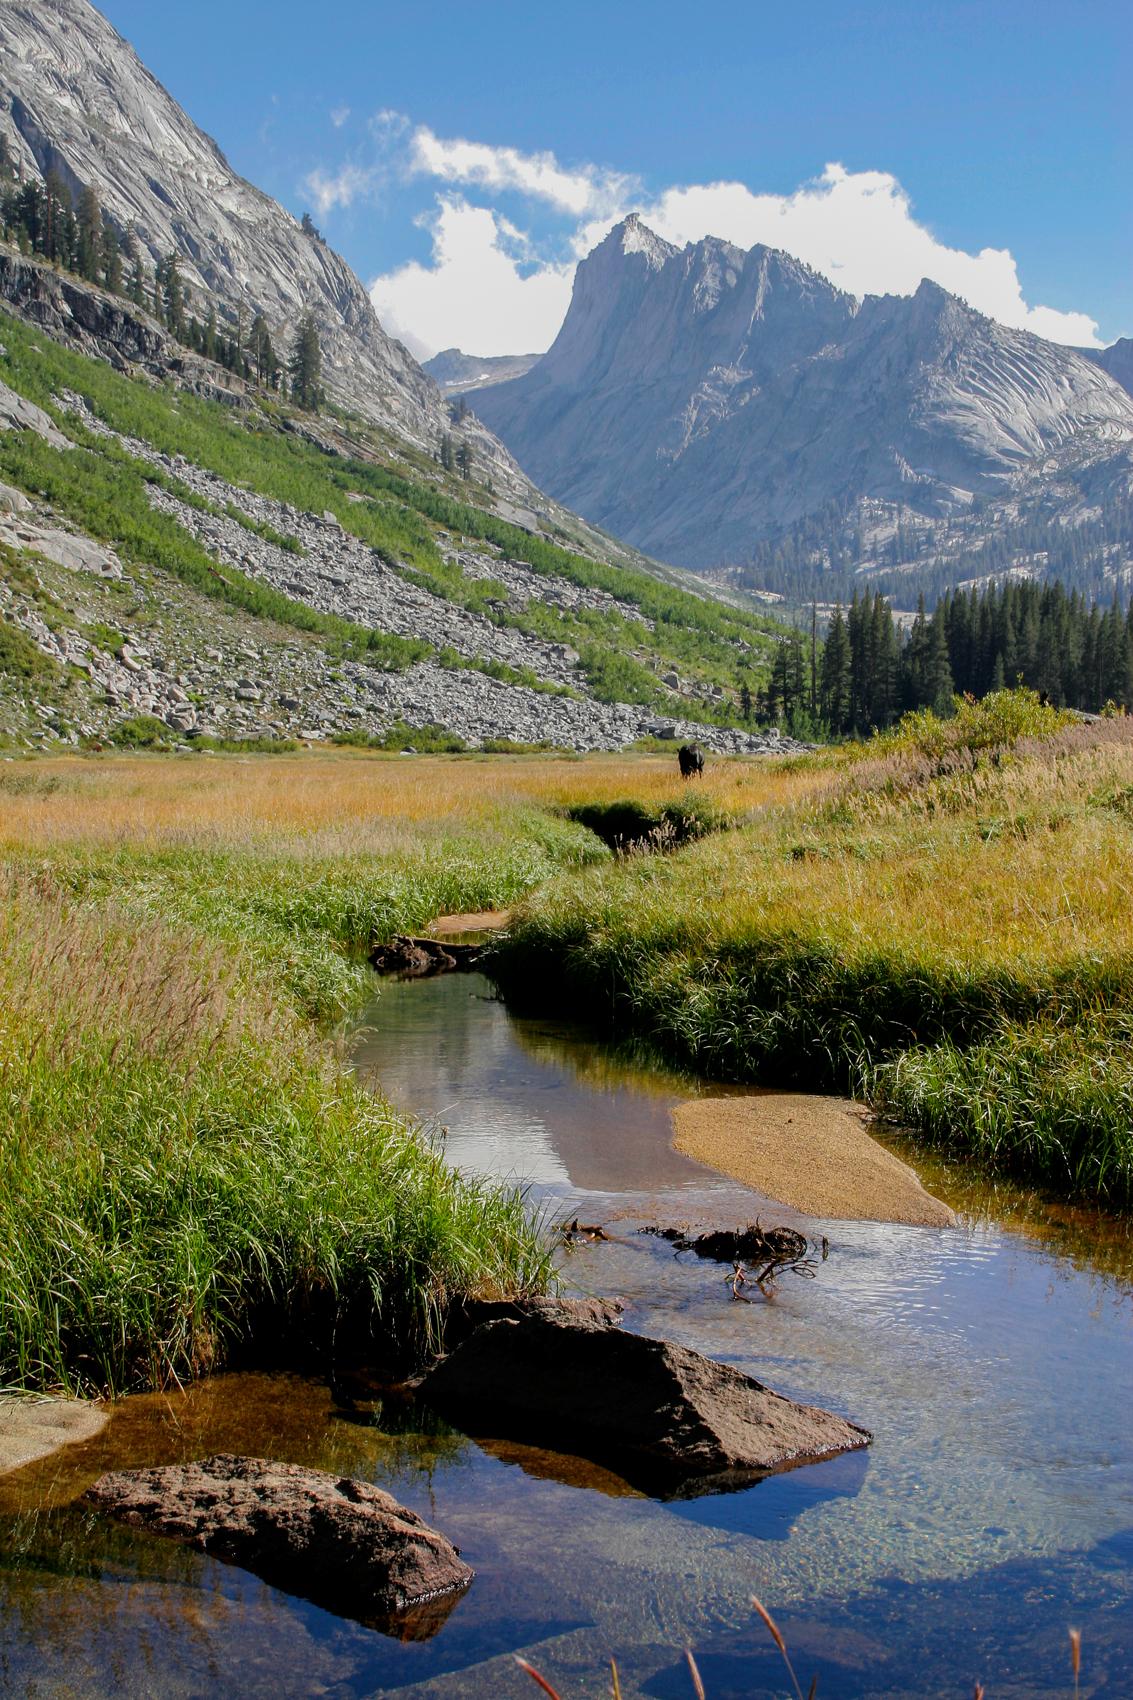 Copper Creek, Sequoia National Park